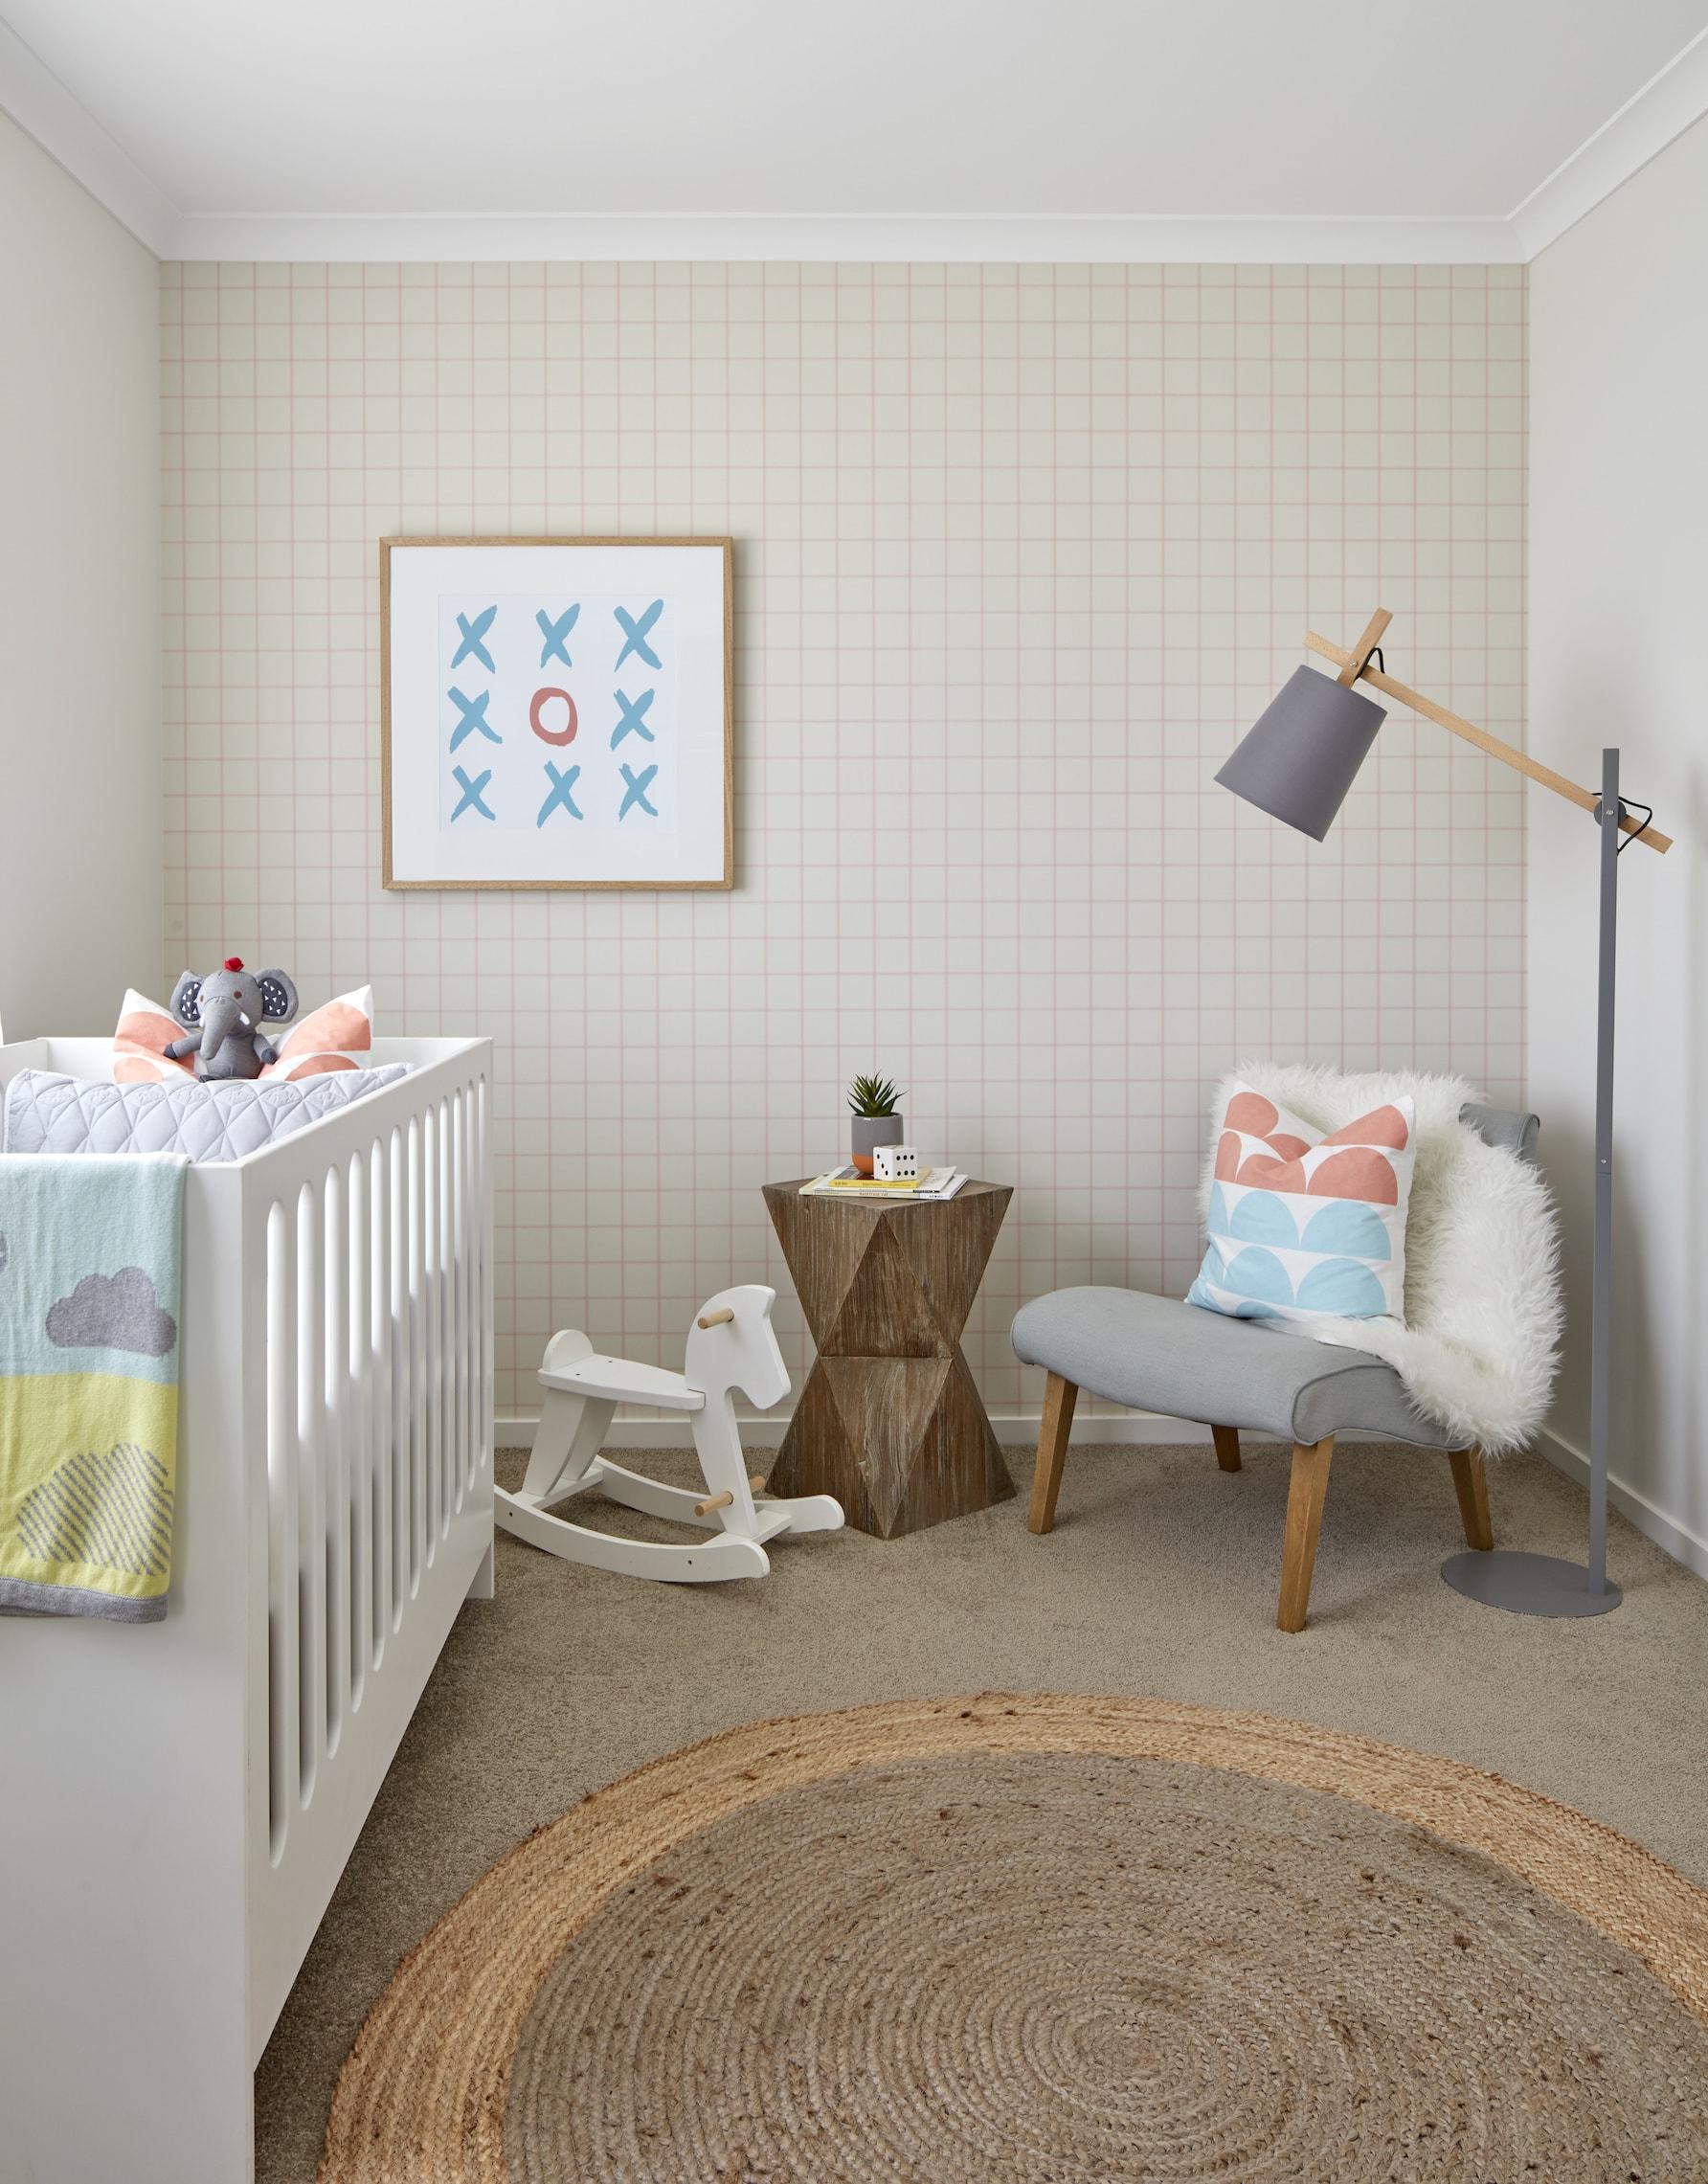 colourful gender neutral nursery design with orange grid wallpaper and round jute rug